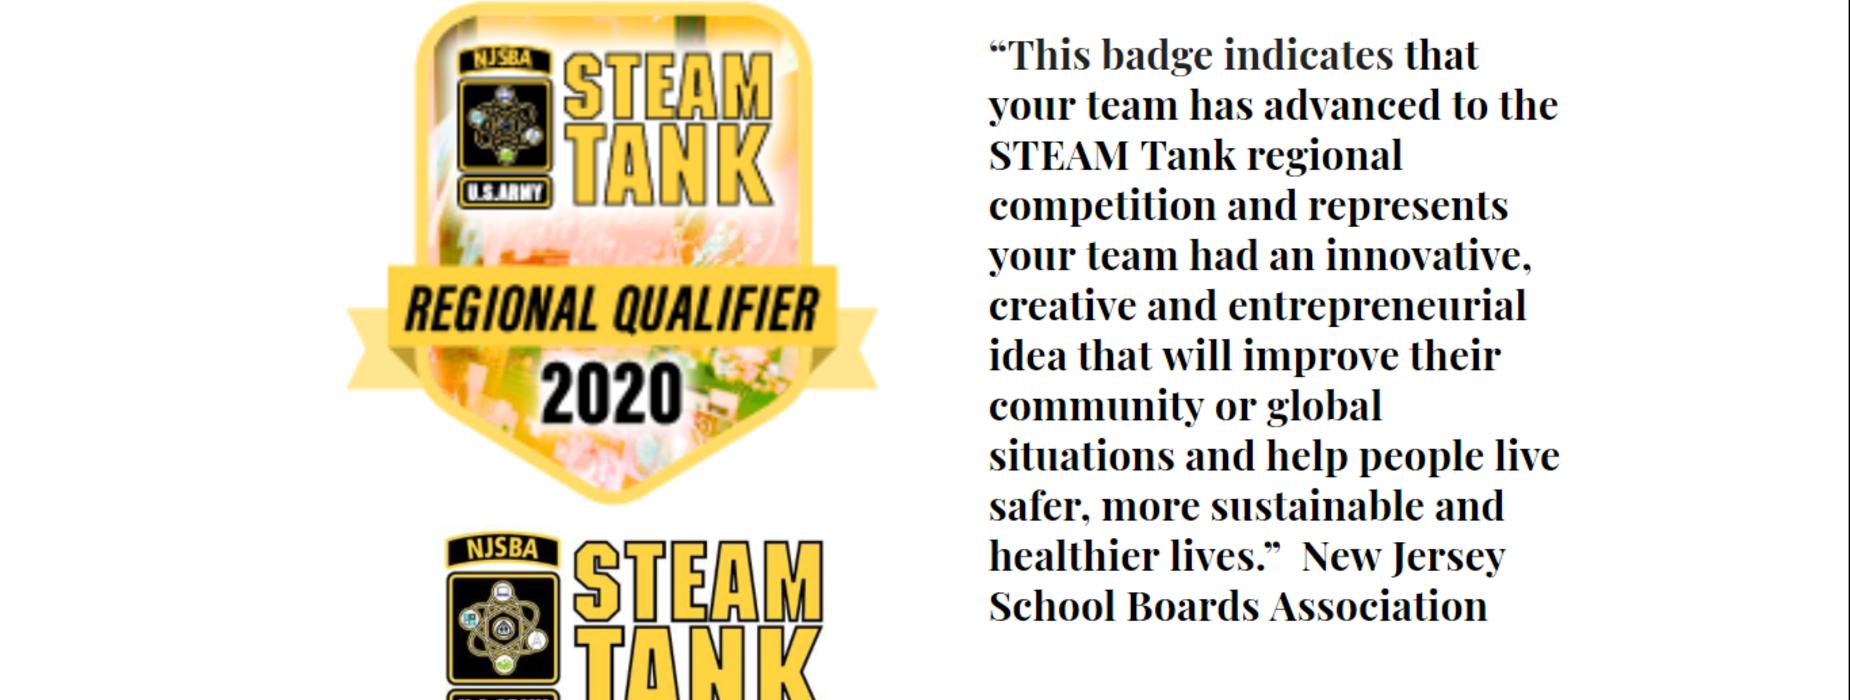 Steam badge